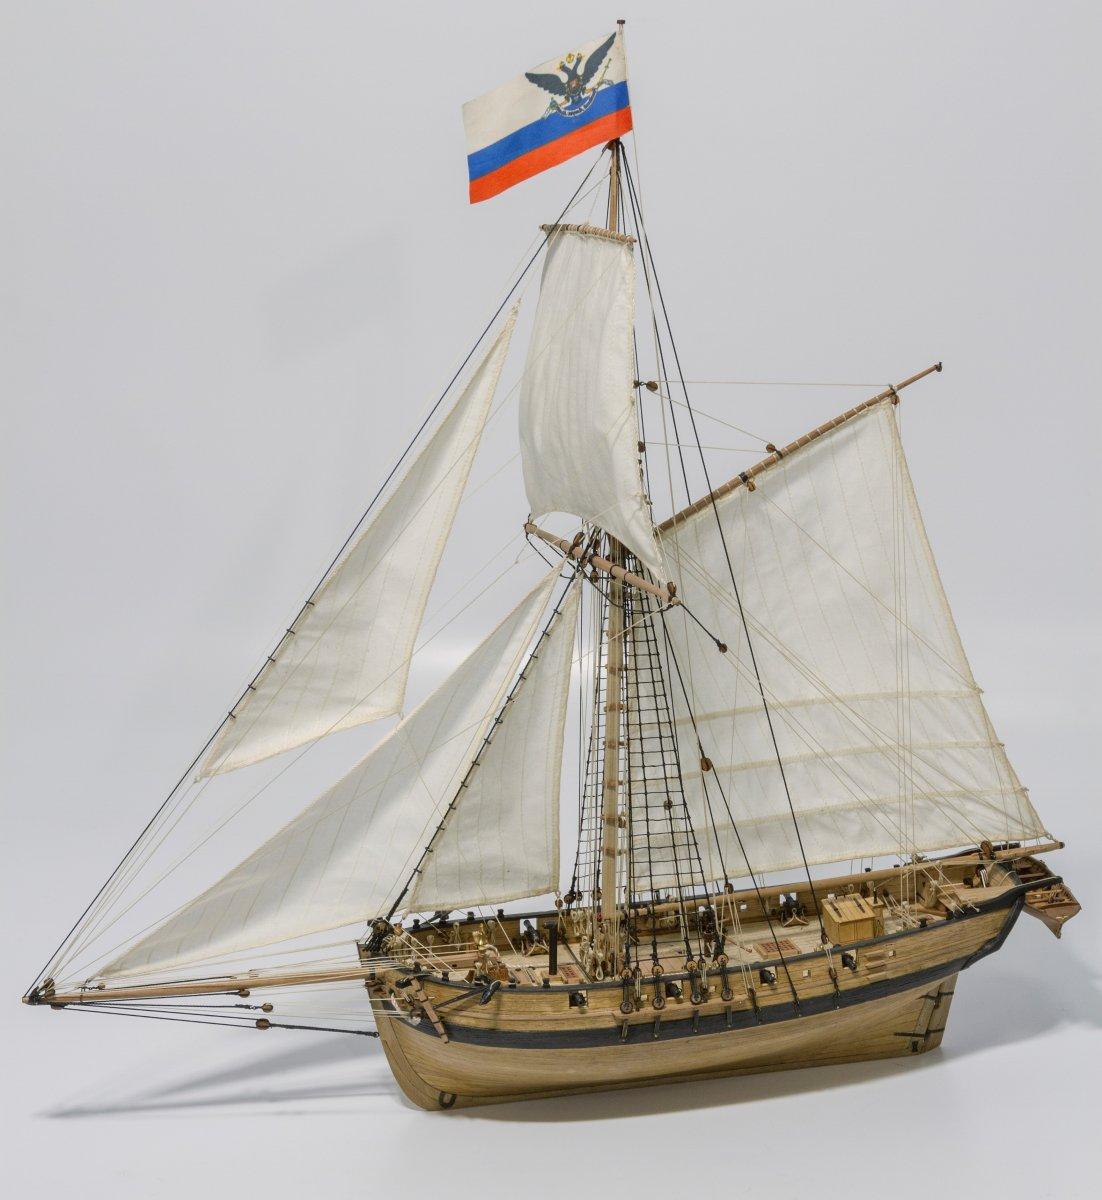 tender-164-00.jpg